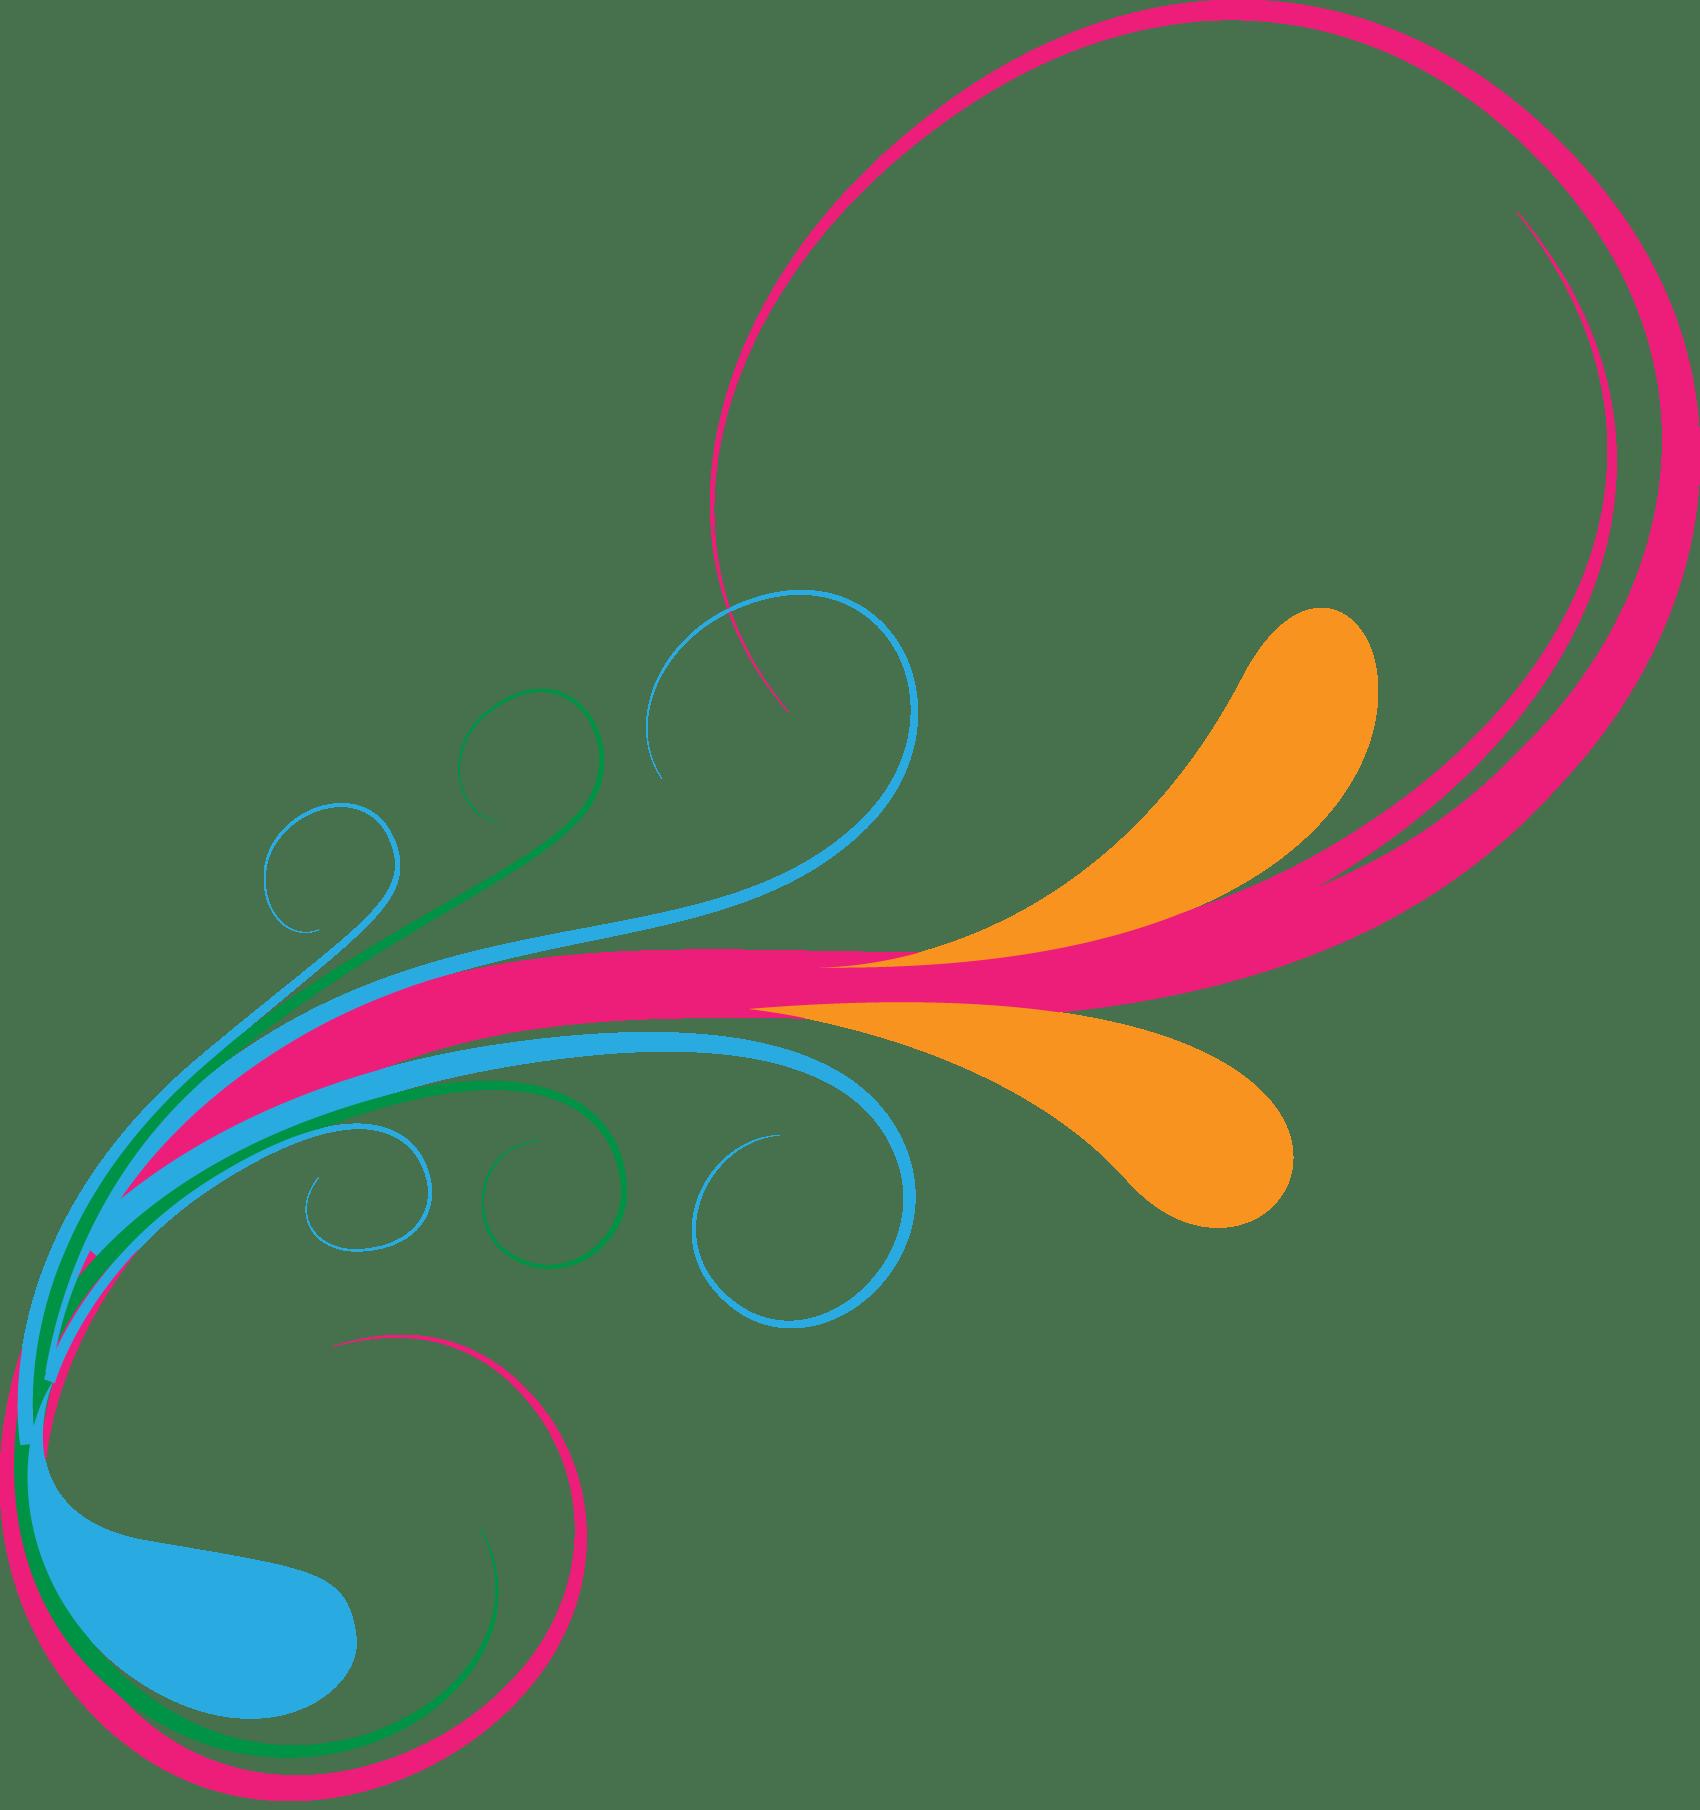 png shermuhammadshakir 5 (4).png Graphic Design